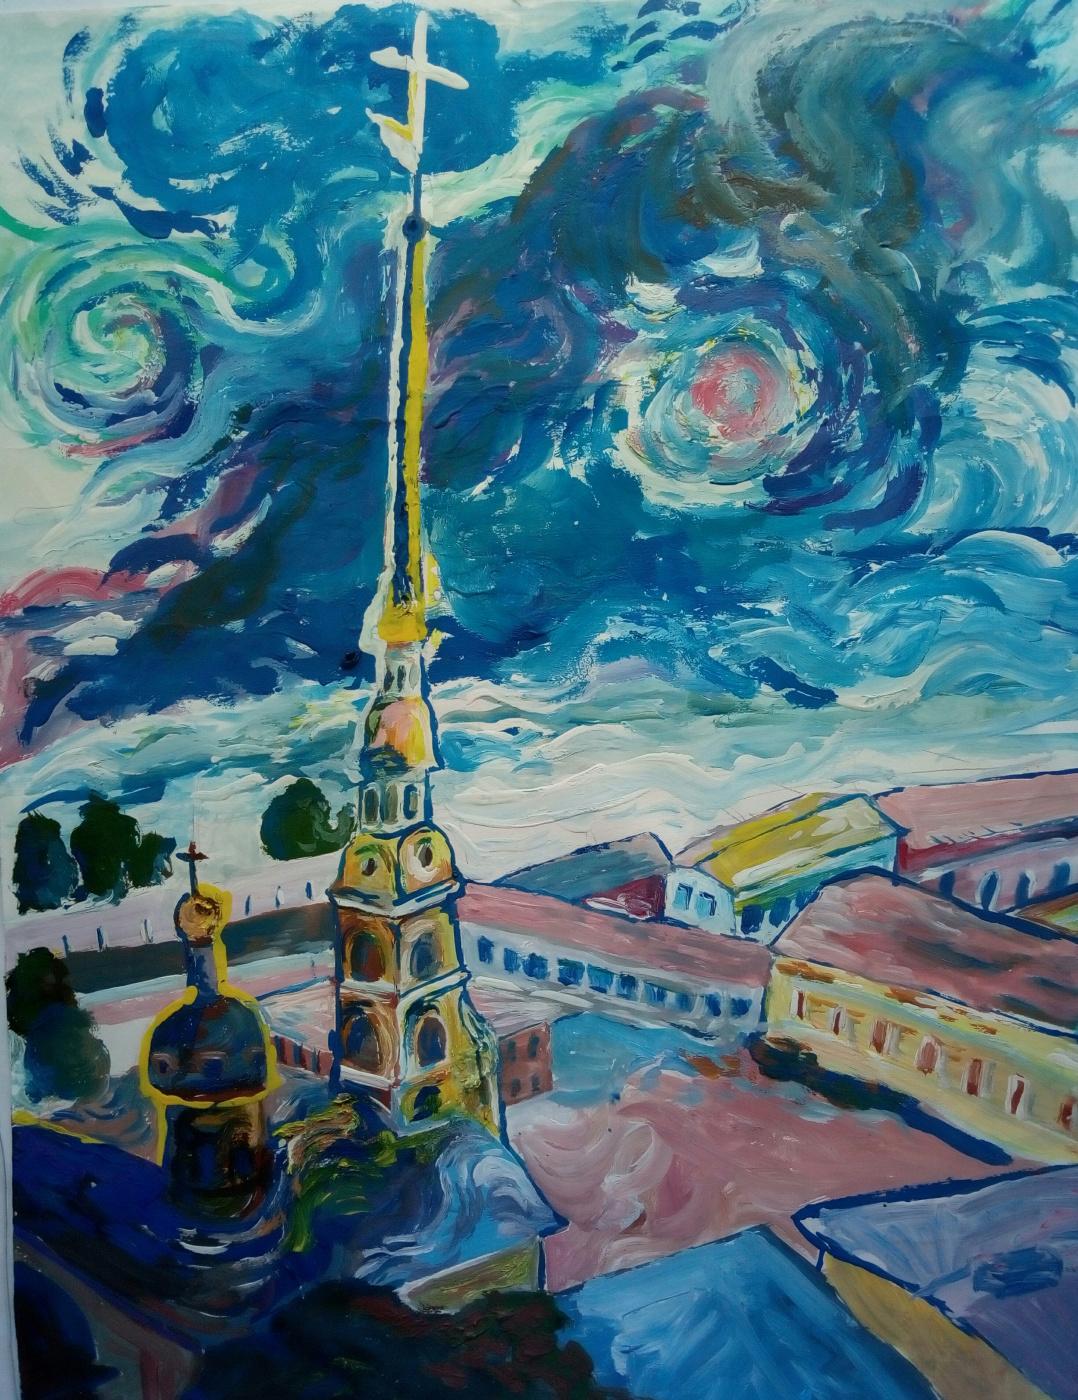 Roman Vereshchagin. Peter-Pavel's Fortress